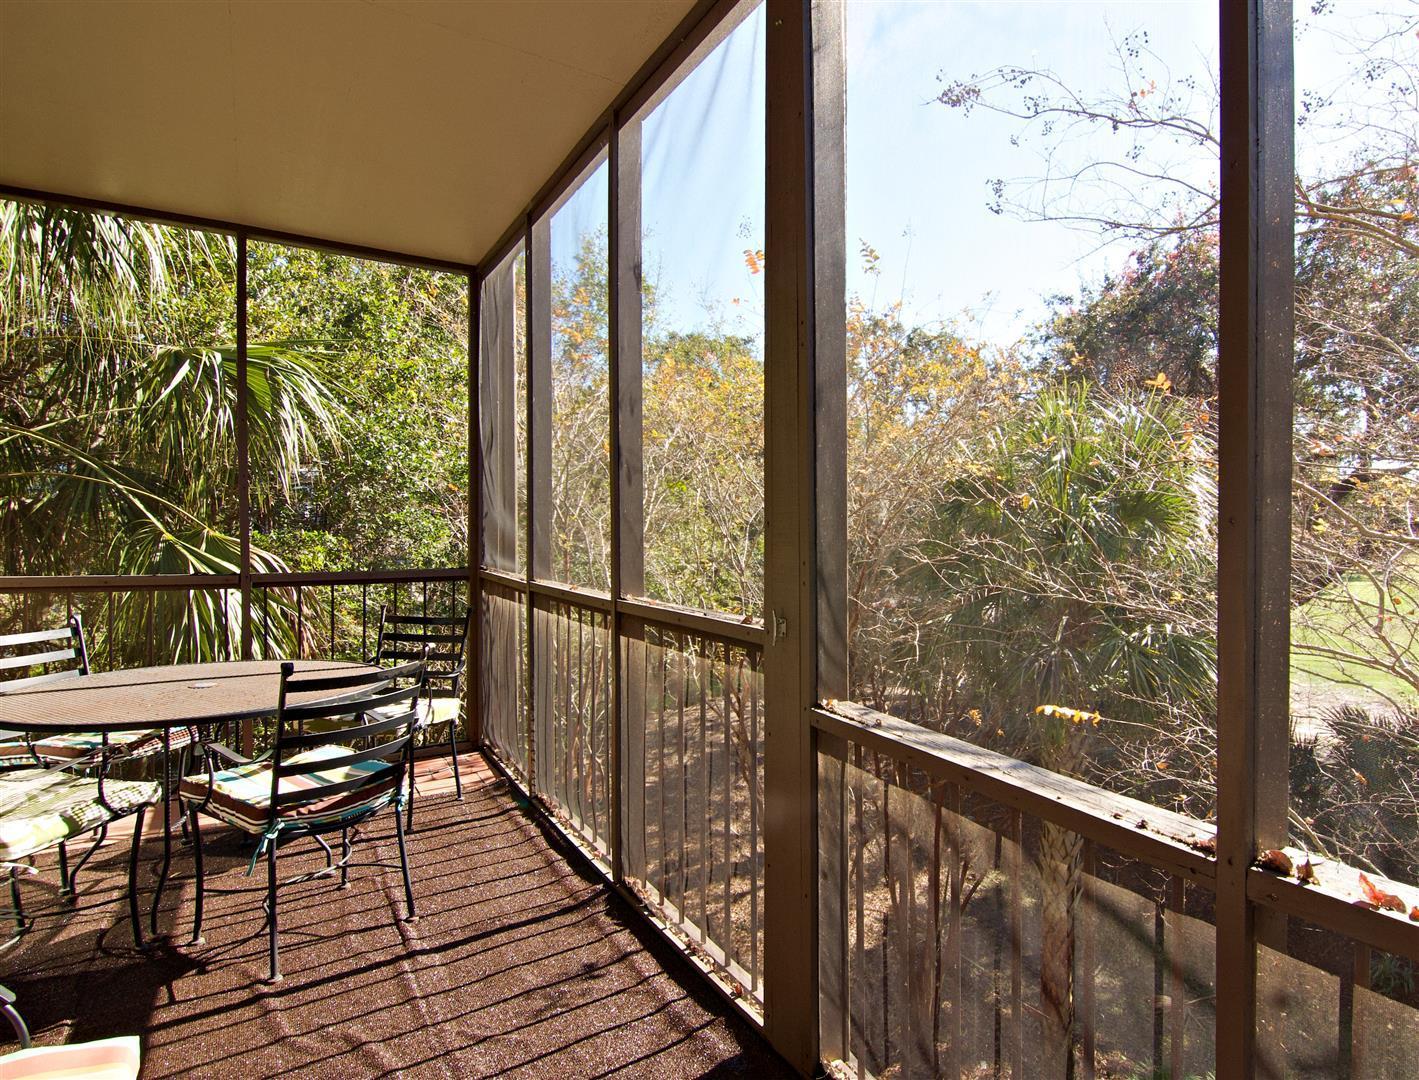 Seabrook Island Homes For Sale - 3020 Ocean Winds, Seabrook Island, SC - 12